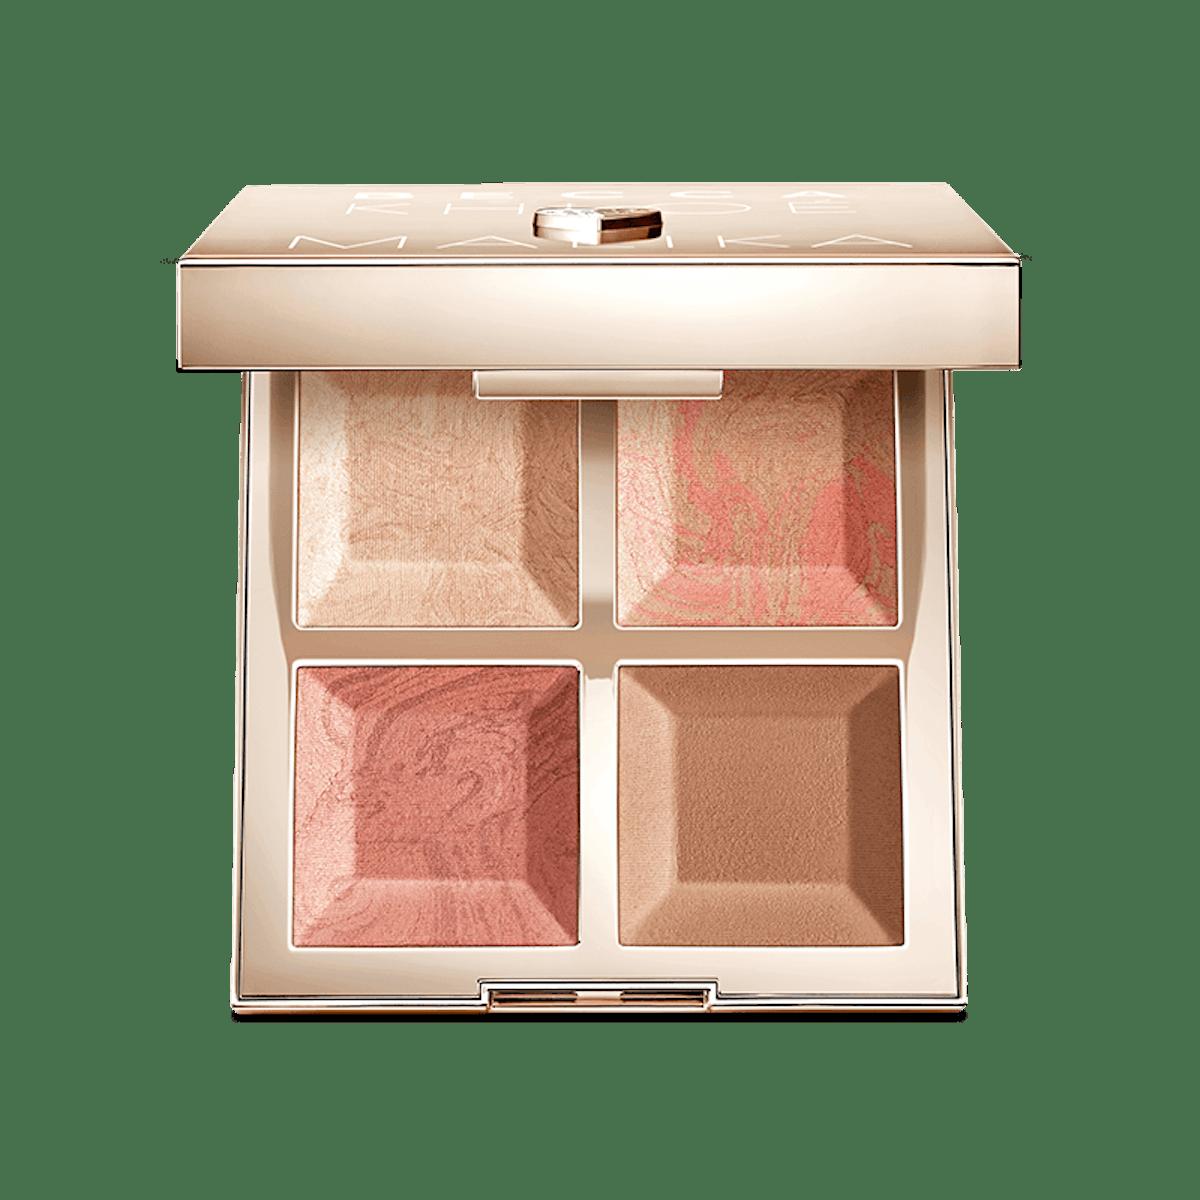 "BECCA x Khloé Kardashian & Malika Haqq Bronze, Blush & Glow Palette in ""Made With Love By Khloé"""